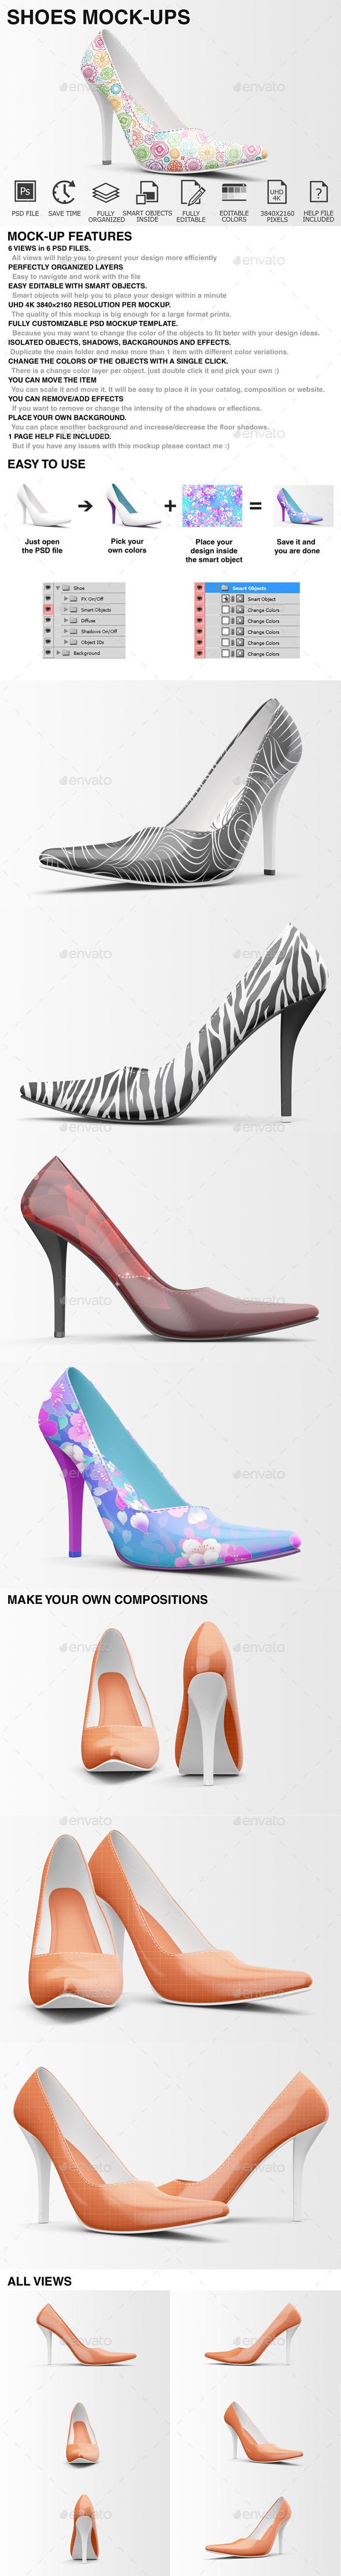 Shoes Mockup - High Heels Mockup Edition - Miscellaneous Apparel